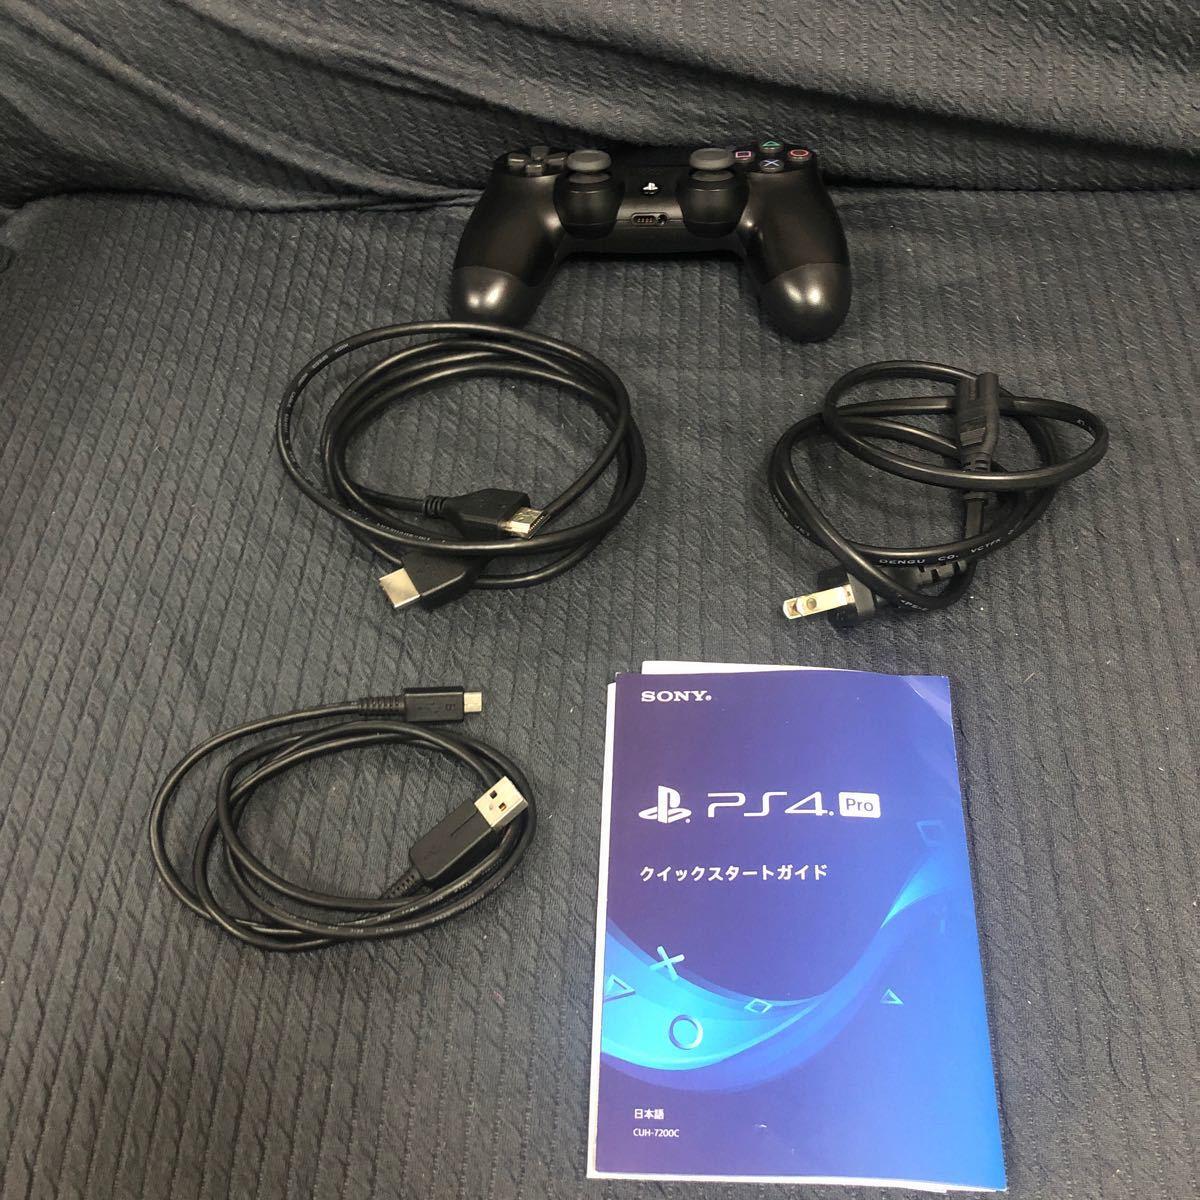 ps PS4 Pro ジェット・ブラック2tb カセット2本    ケーブル一式有 動作確認済